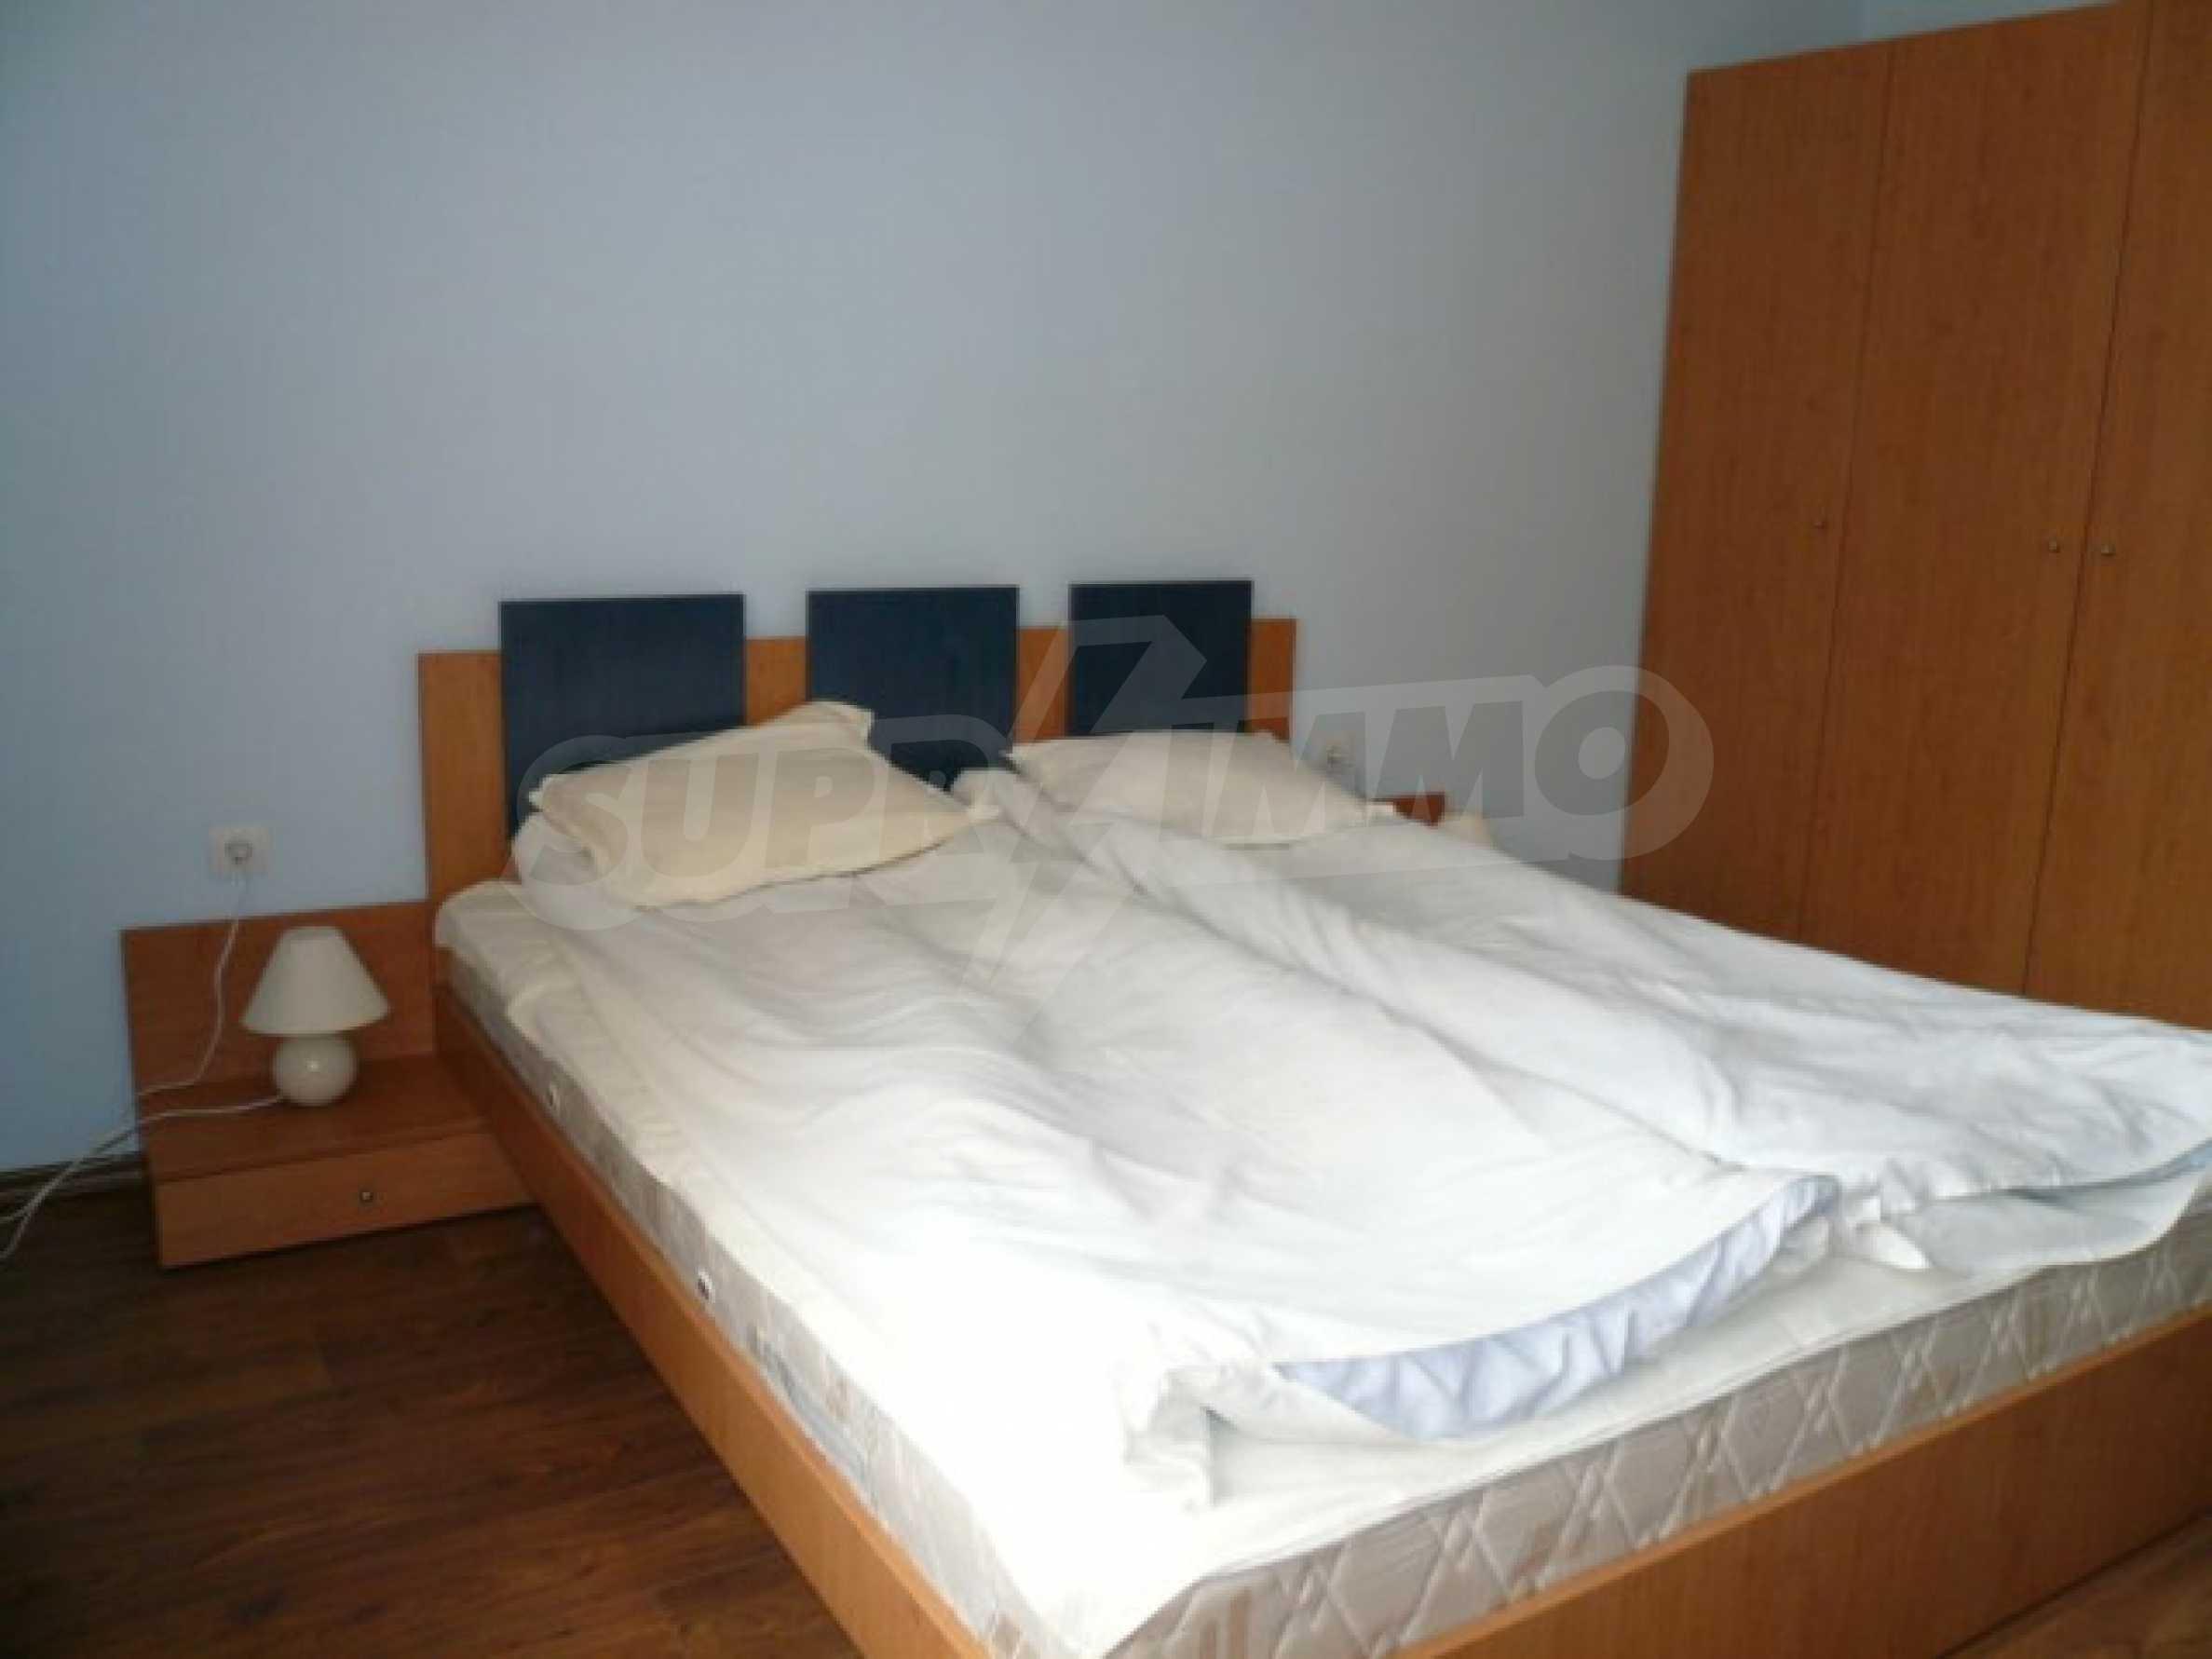 Двустаен апартамент за продажба в гр. Банско 6